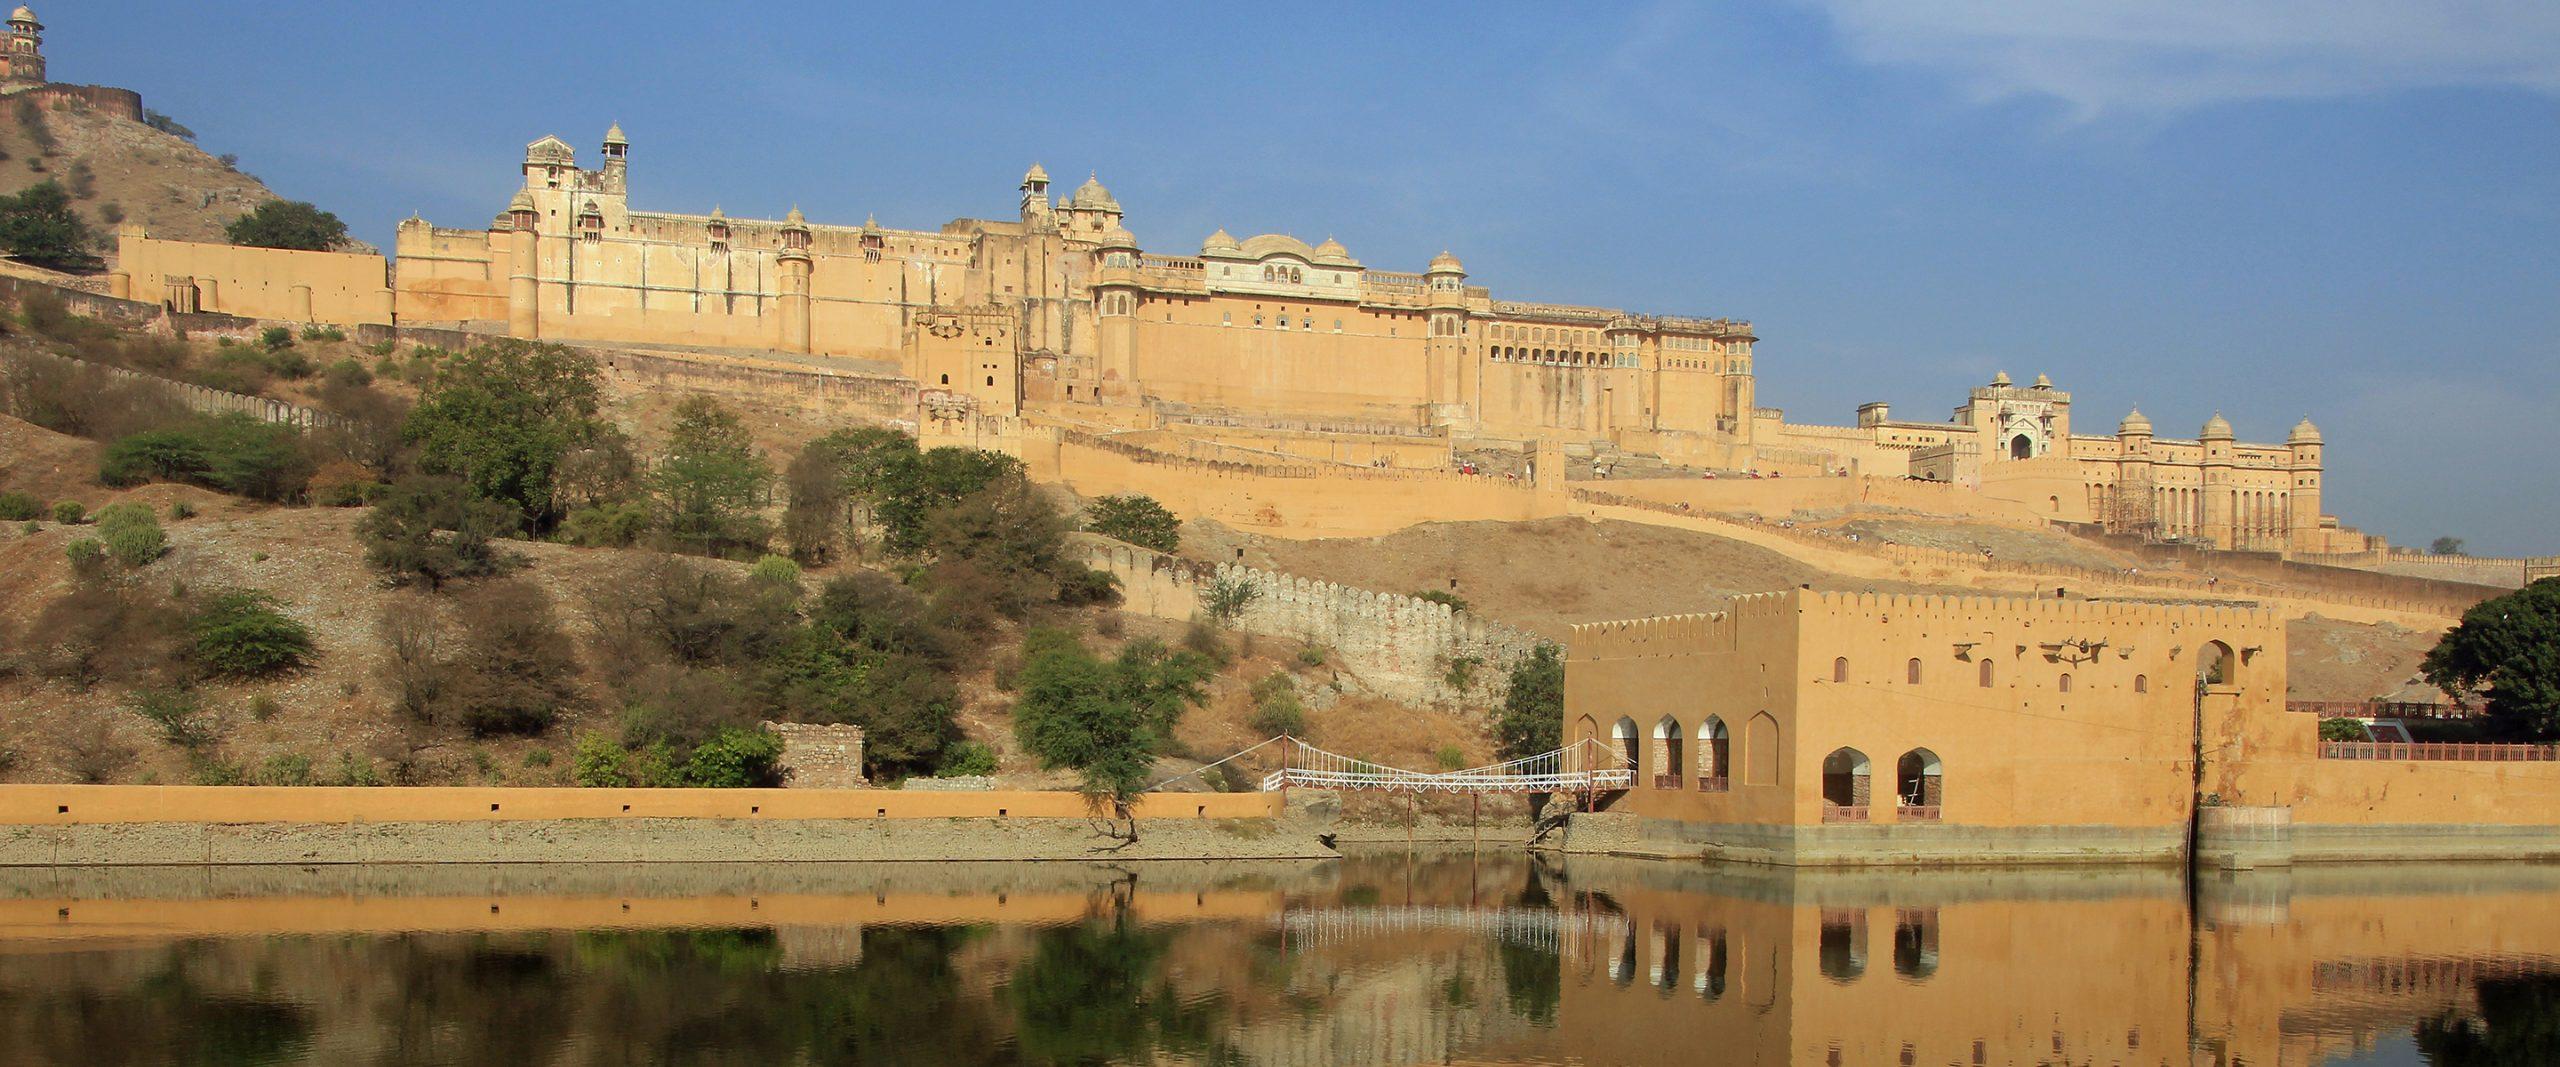 Gruppenreise Indien - Festung Amber